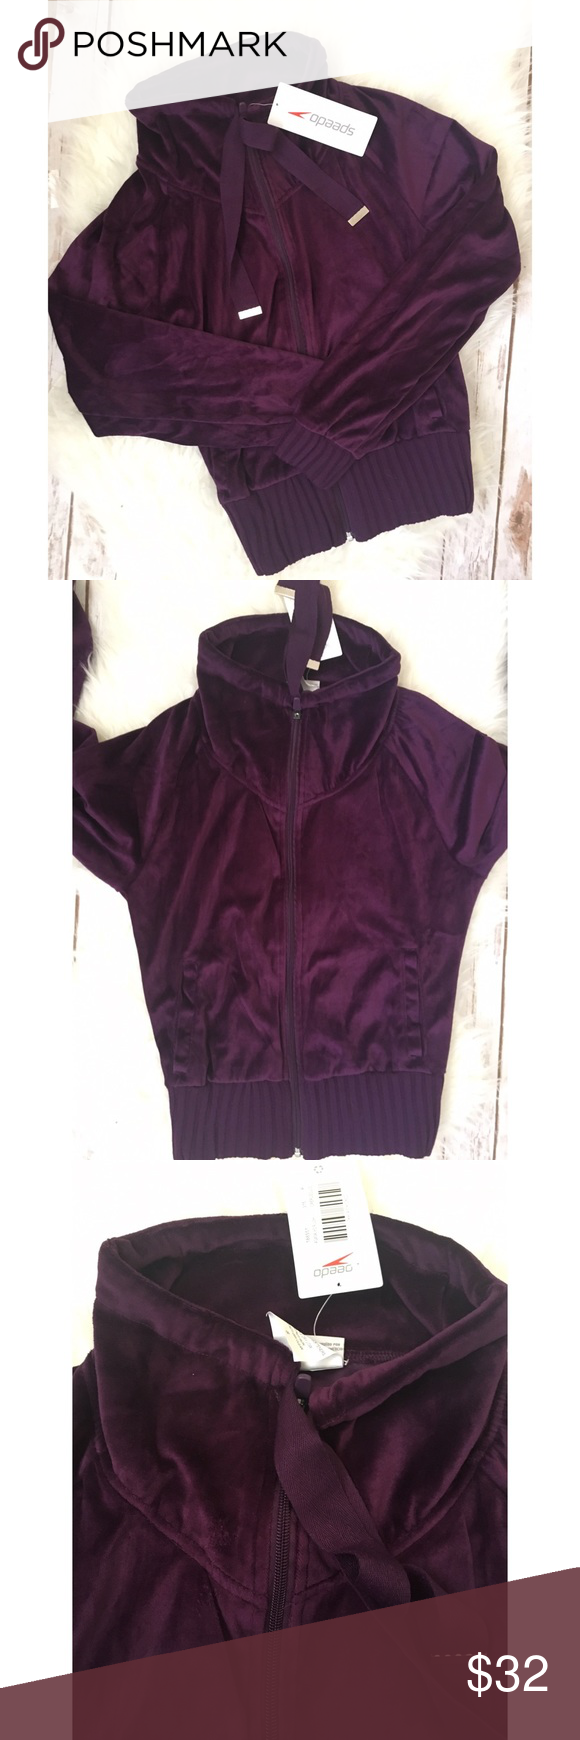 NWT women's Speedo purple velour track jacket Brand new with tags women's plum purple velour full zip track jacket size small.  Slouchy collar. Really nice lululemon athletica Tops Sweatshirts & Hoodies